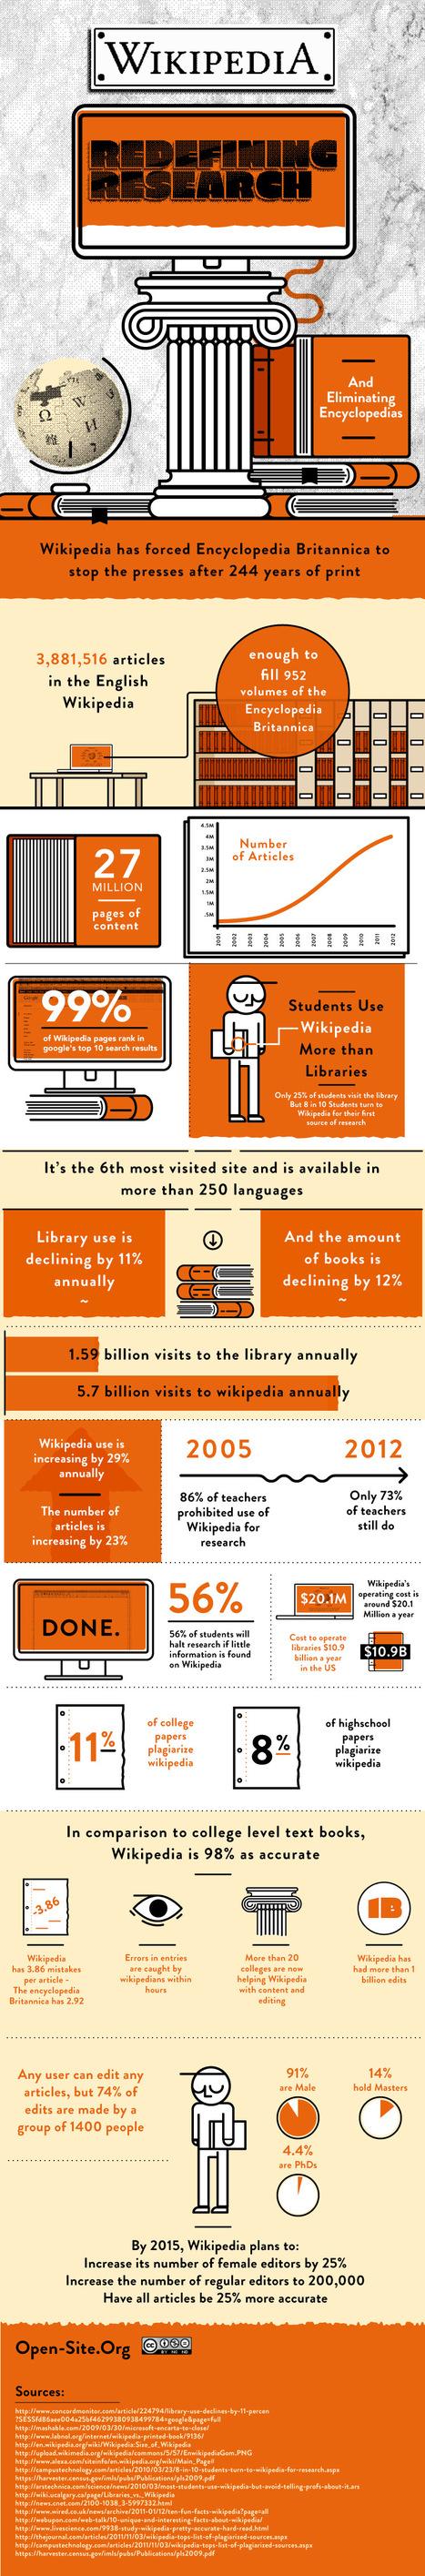 Qualche dato suWikipedia | Web 2.0 Marketing Social & Digital Media | Scoop.it